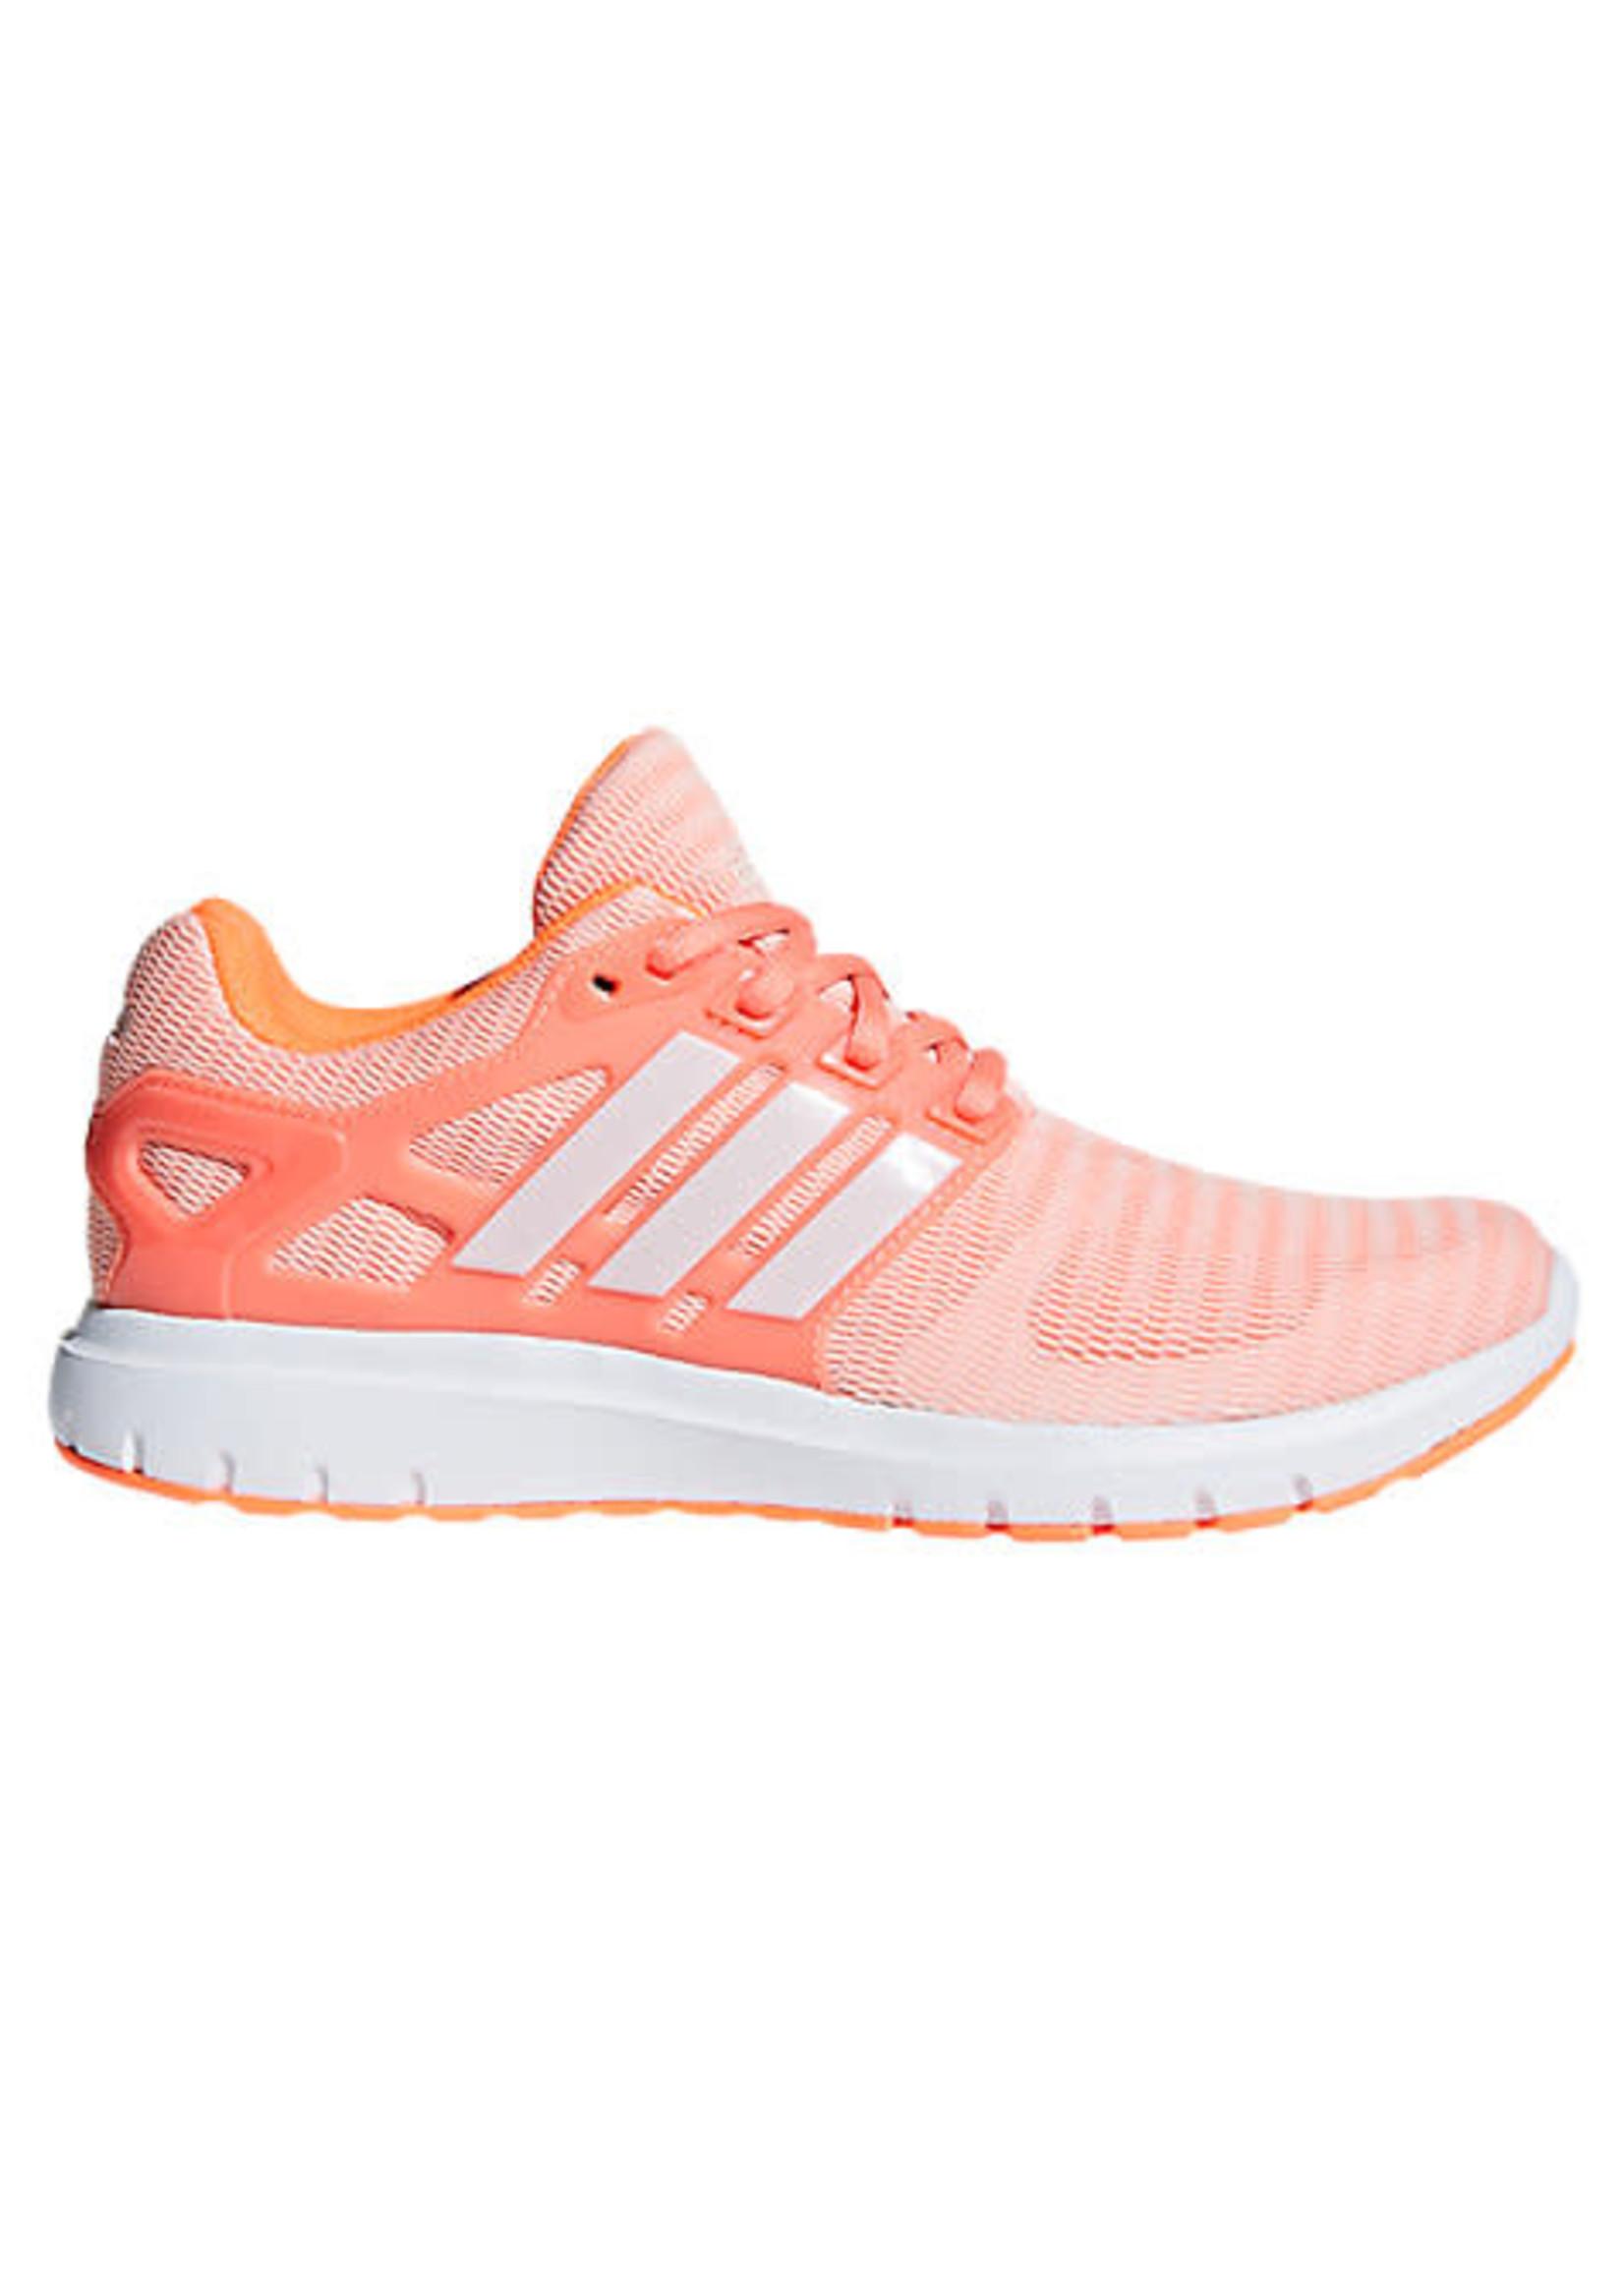 Adidas Adidas Ladies Energy Cloud V Shoe (2018) Coral 7.5